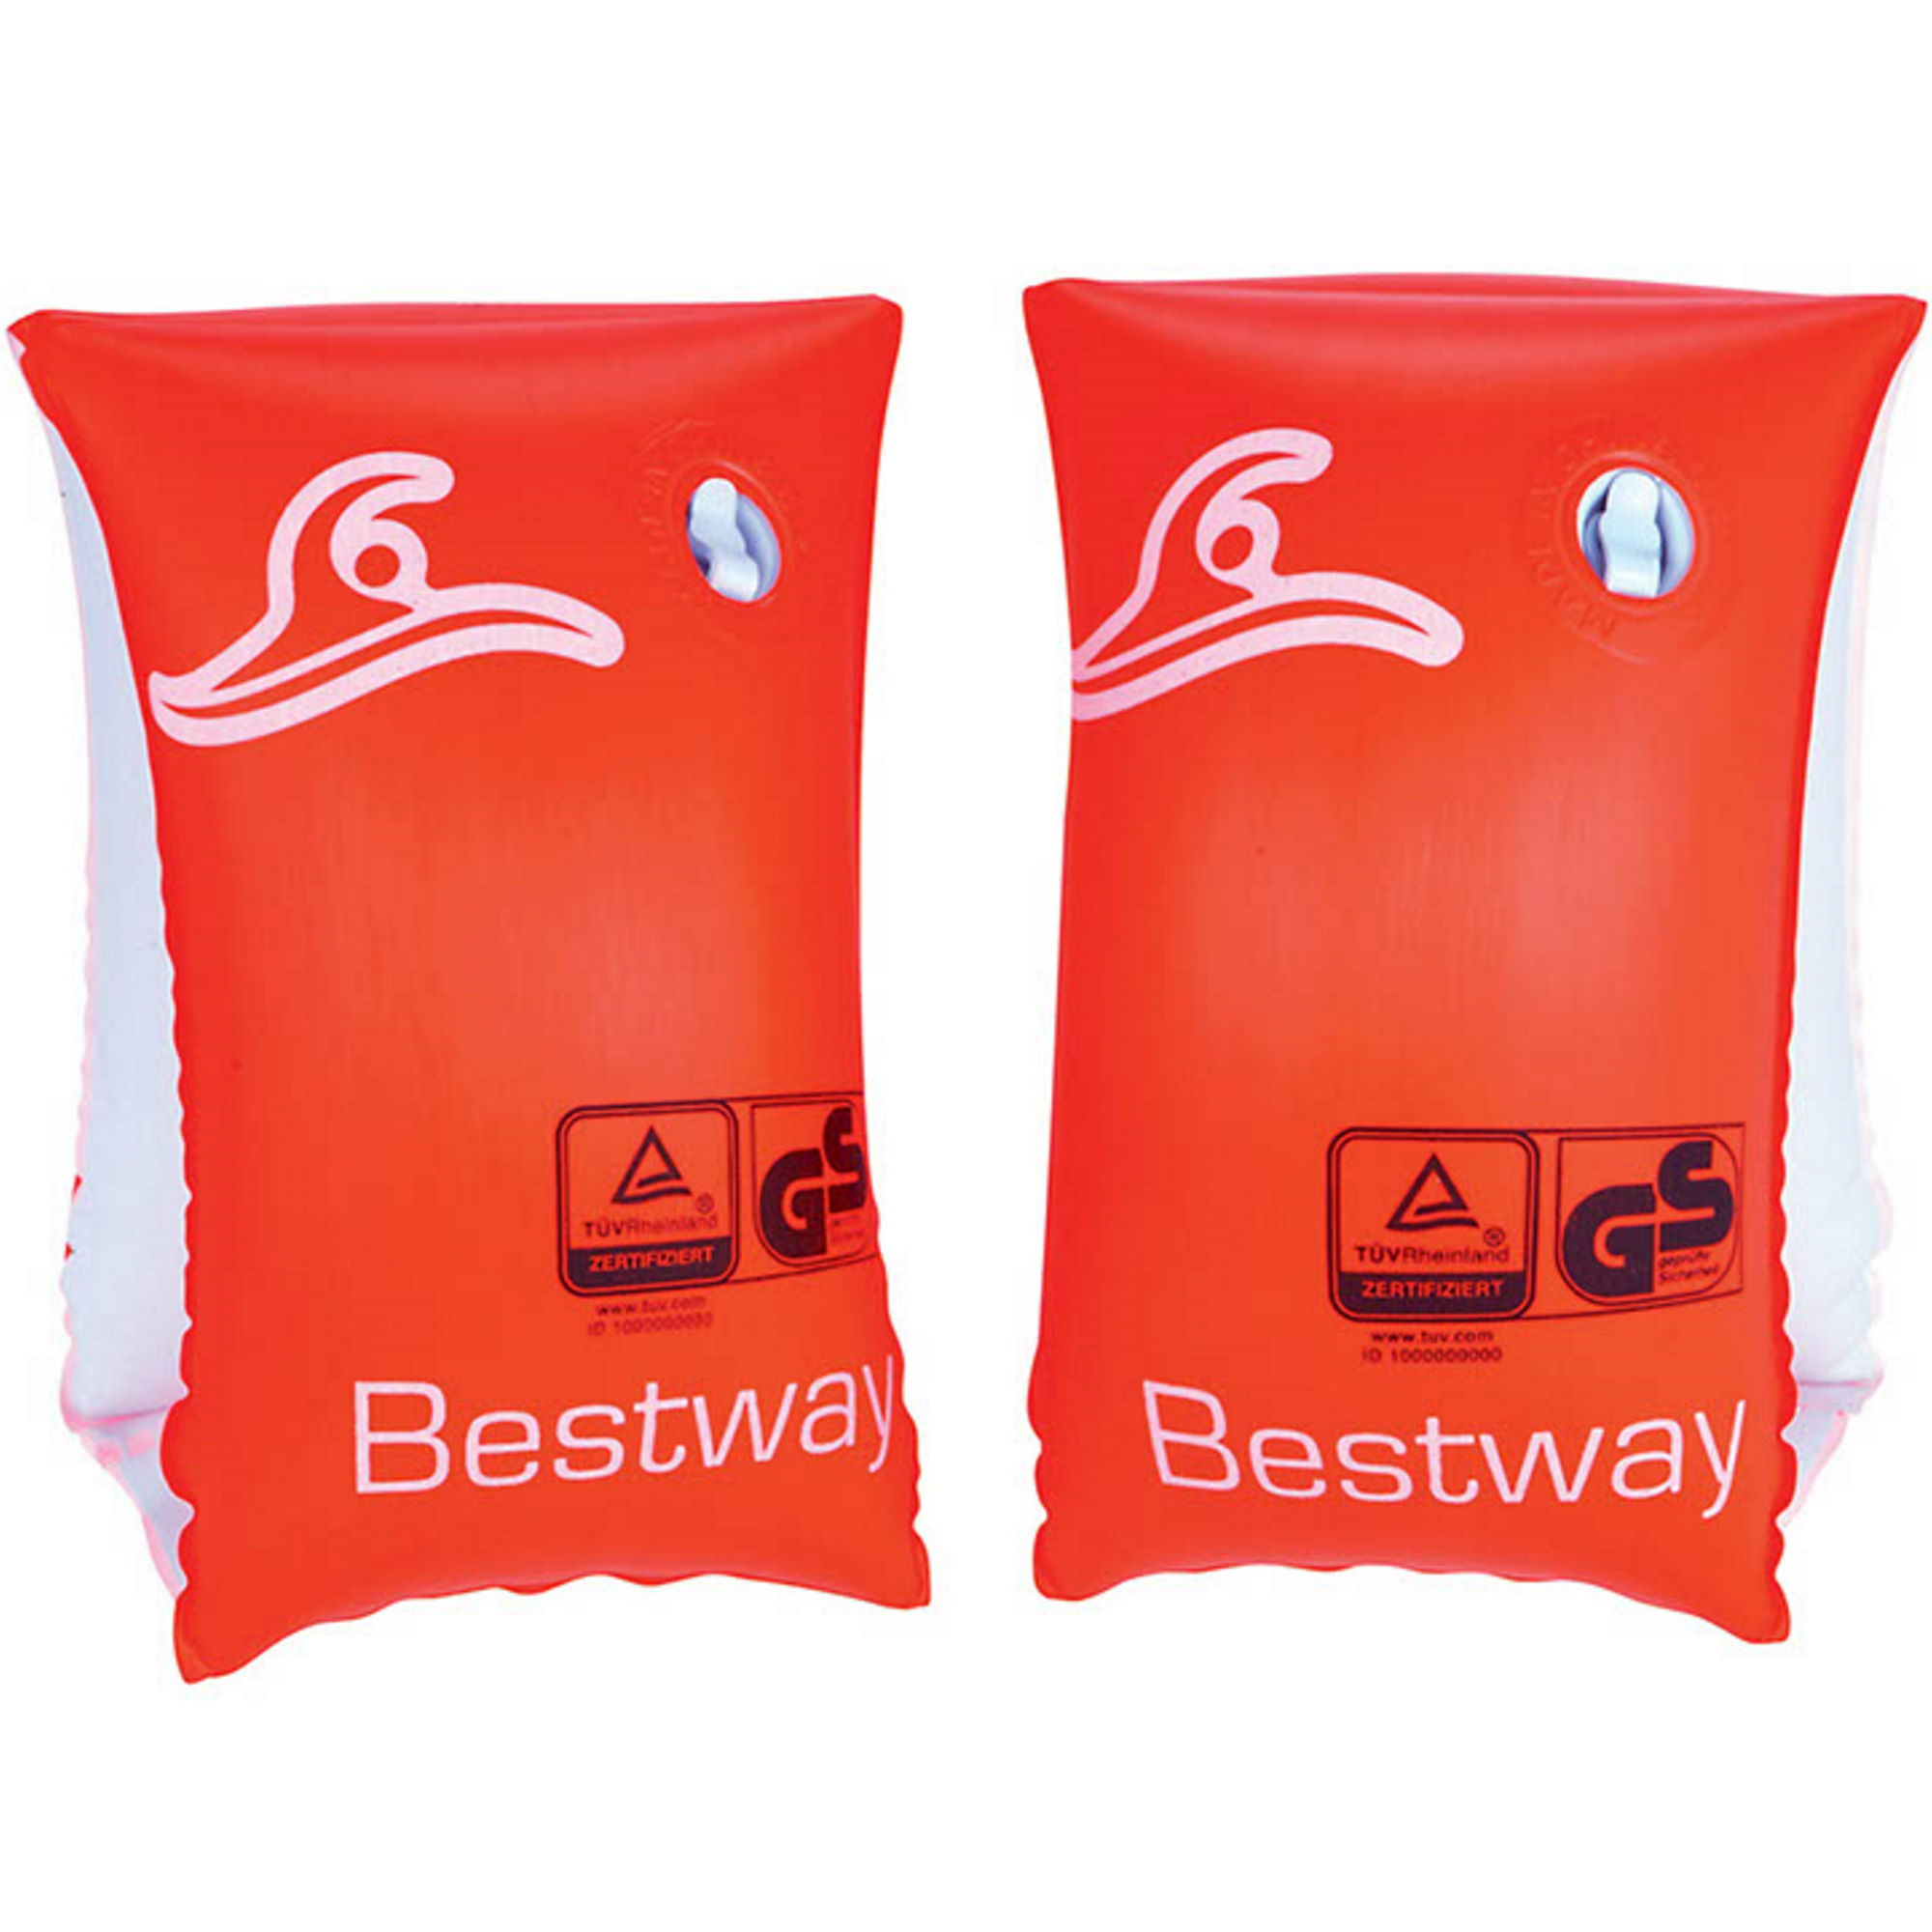 Bestway 32114 25 x 13cm  Safe-2-Swim Premium Trainers